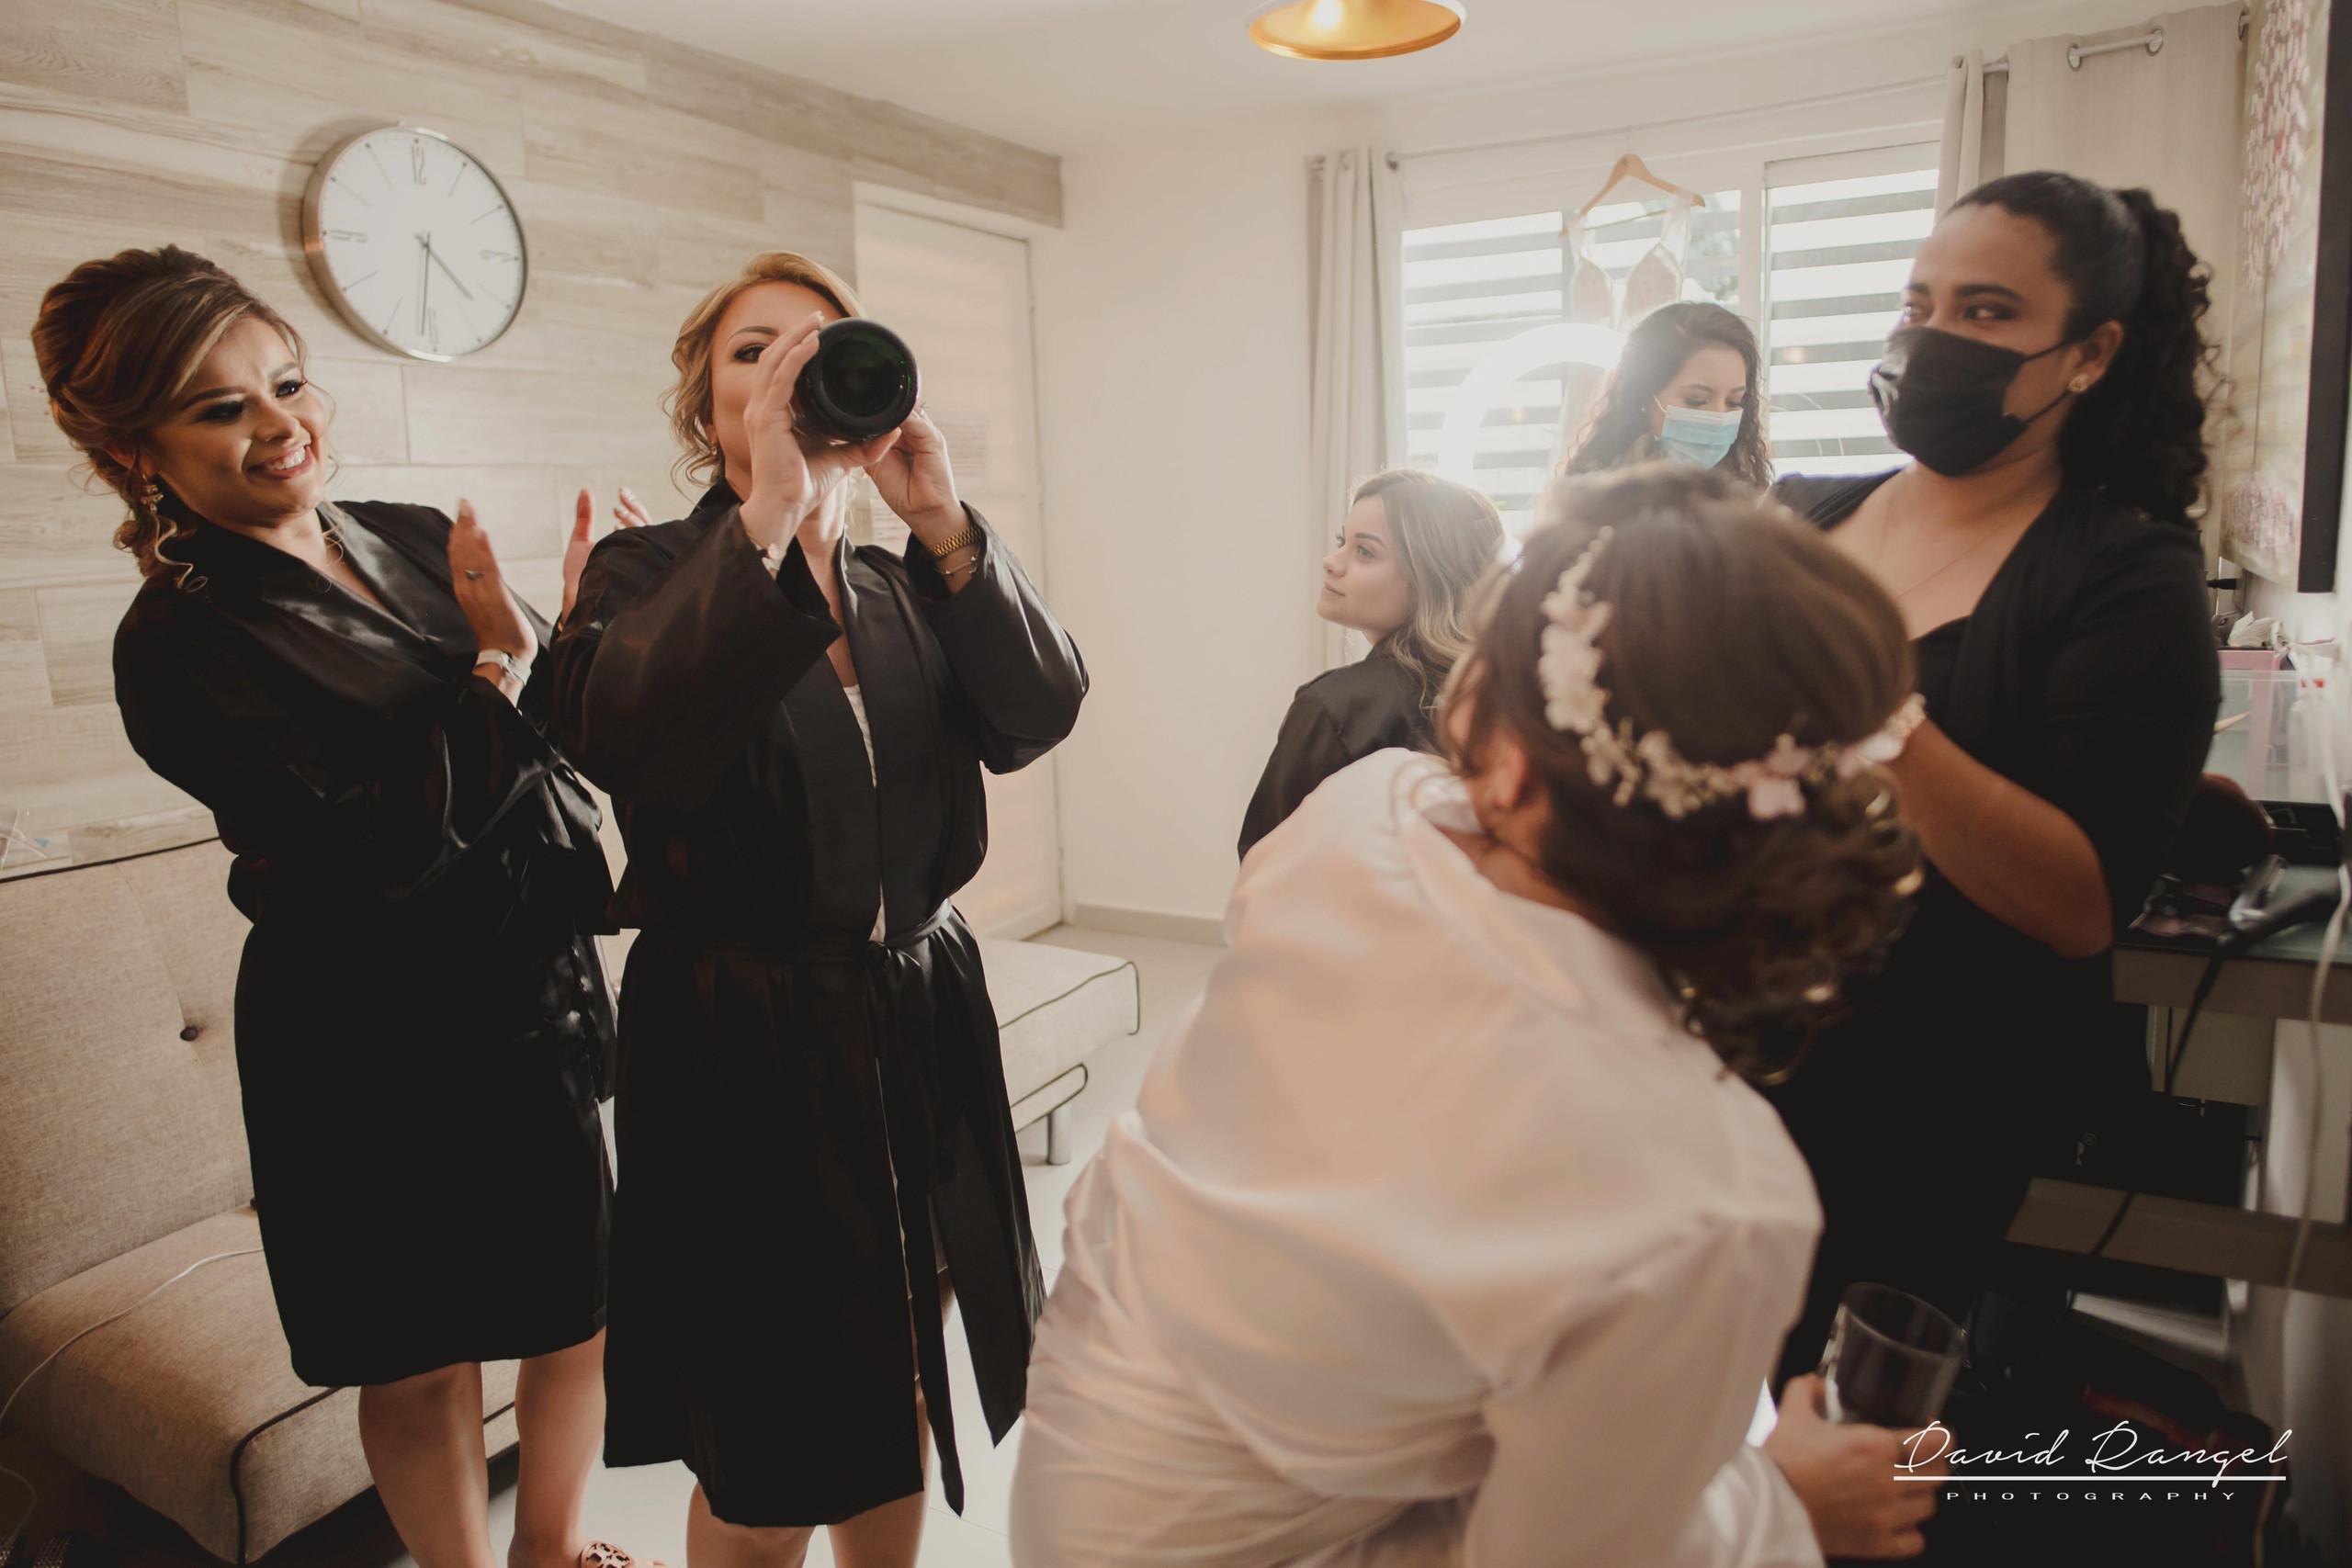 bride+getting+ready+shadow+earring++bathrobe+natural+ligh+photo+destination+wedding+isla+blanca+smile+champagne+mirror+photo+celebration+drink+alcohol+mother+of+the+bride+crue